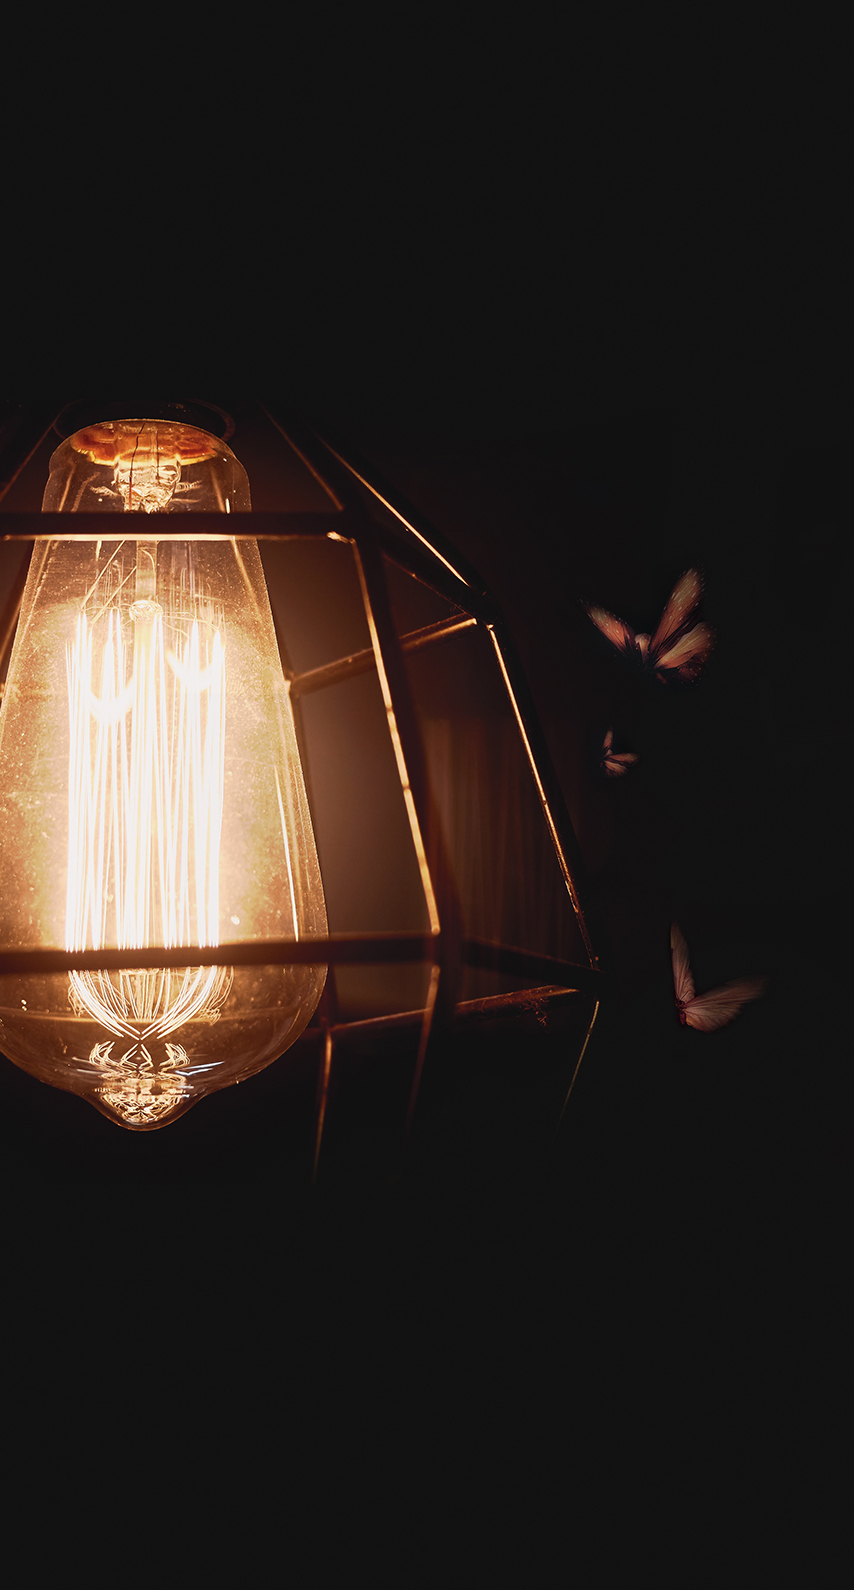 gold, architecture, illuminated, studio, glass items, spotlight, lantern, candle, bulb